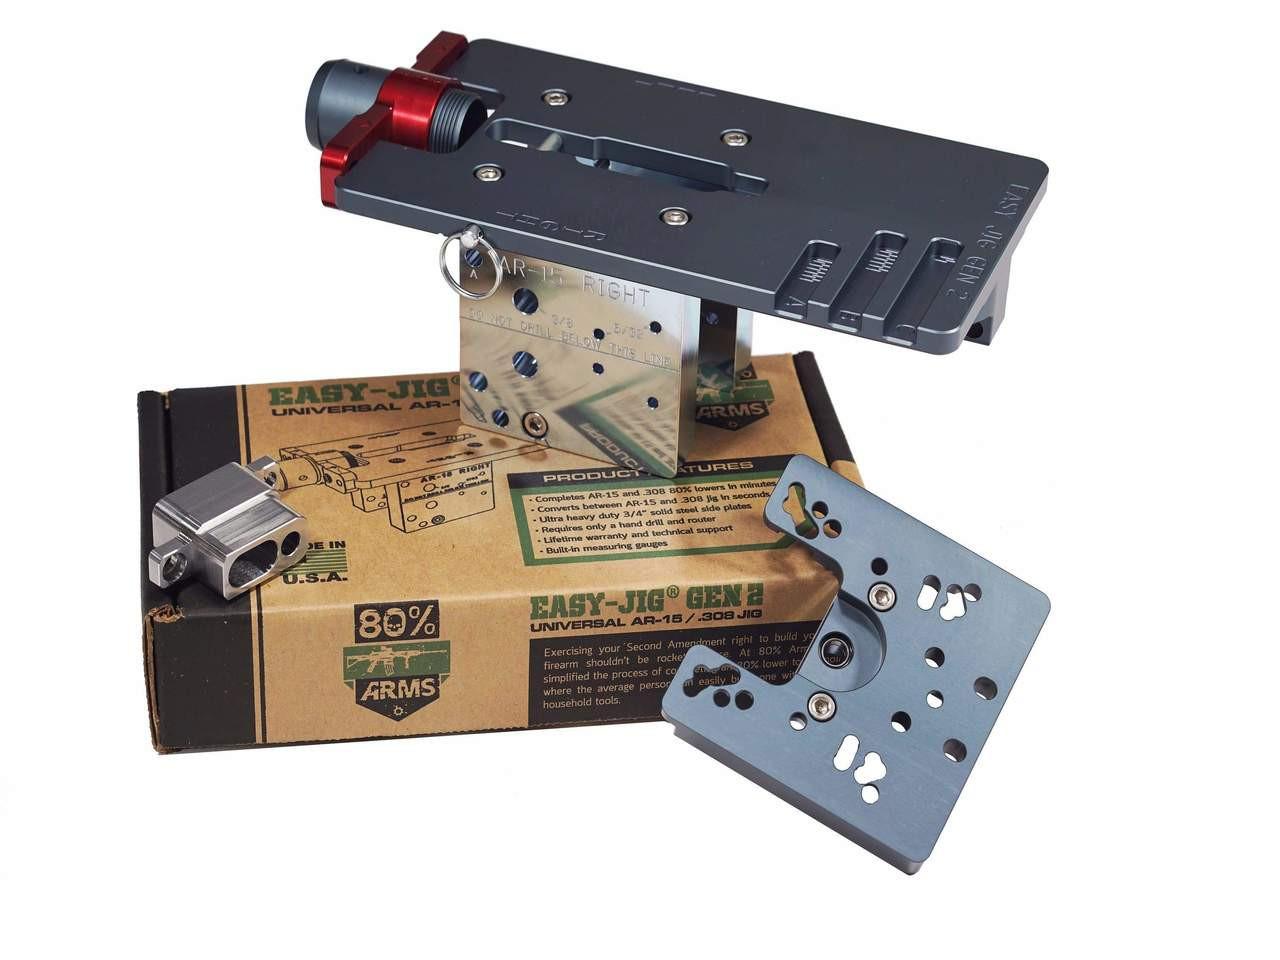 Easy Jig Gen 2 Multi-Platform - AR-15 and  308 80% Lower Jig